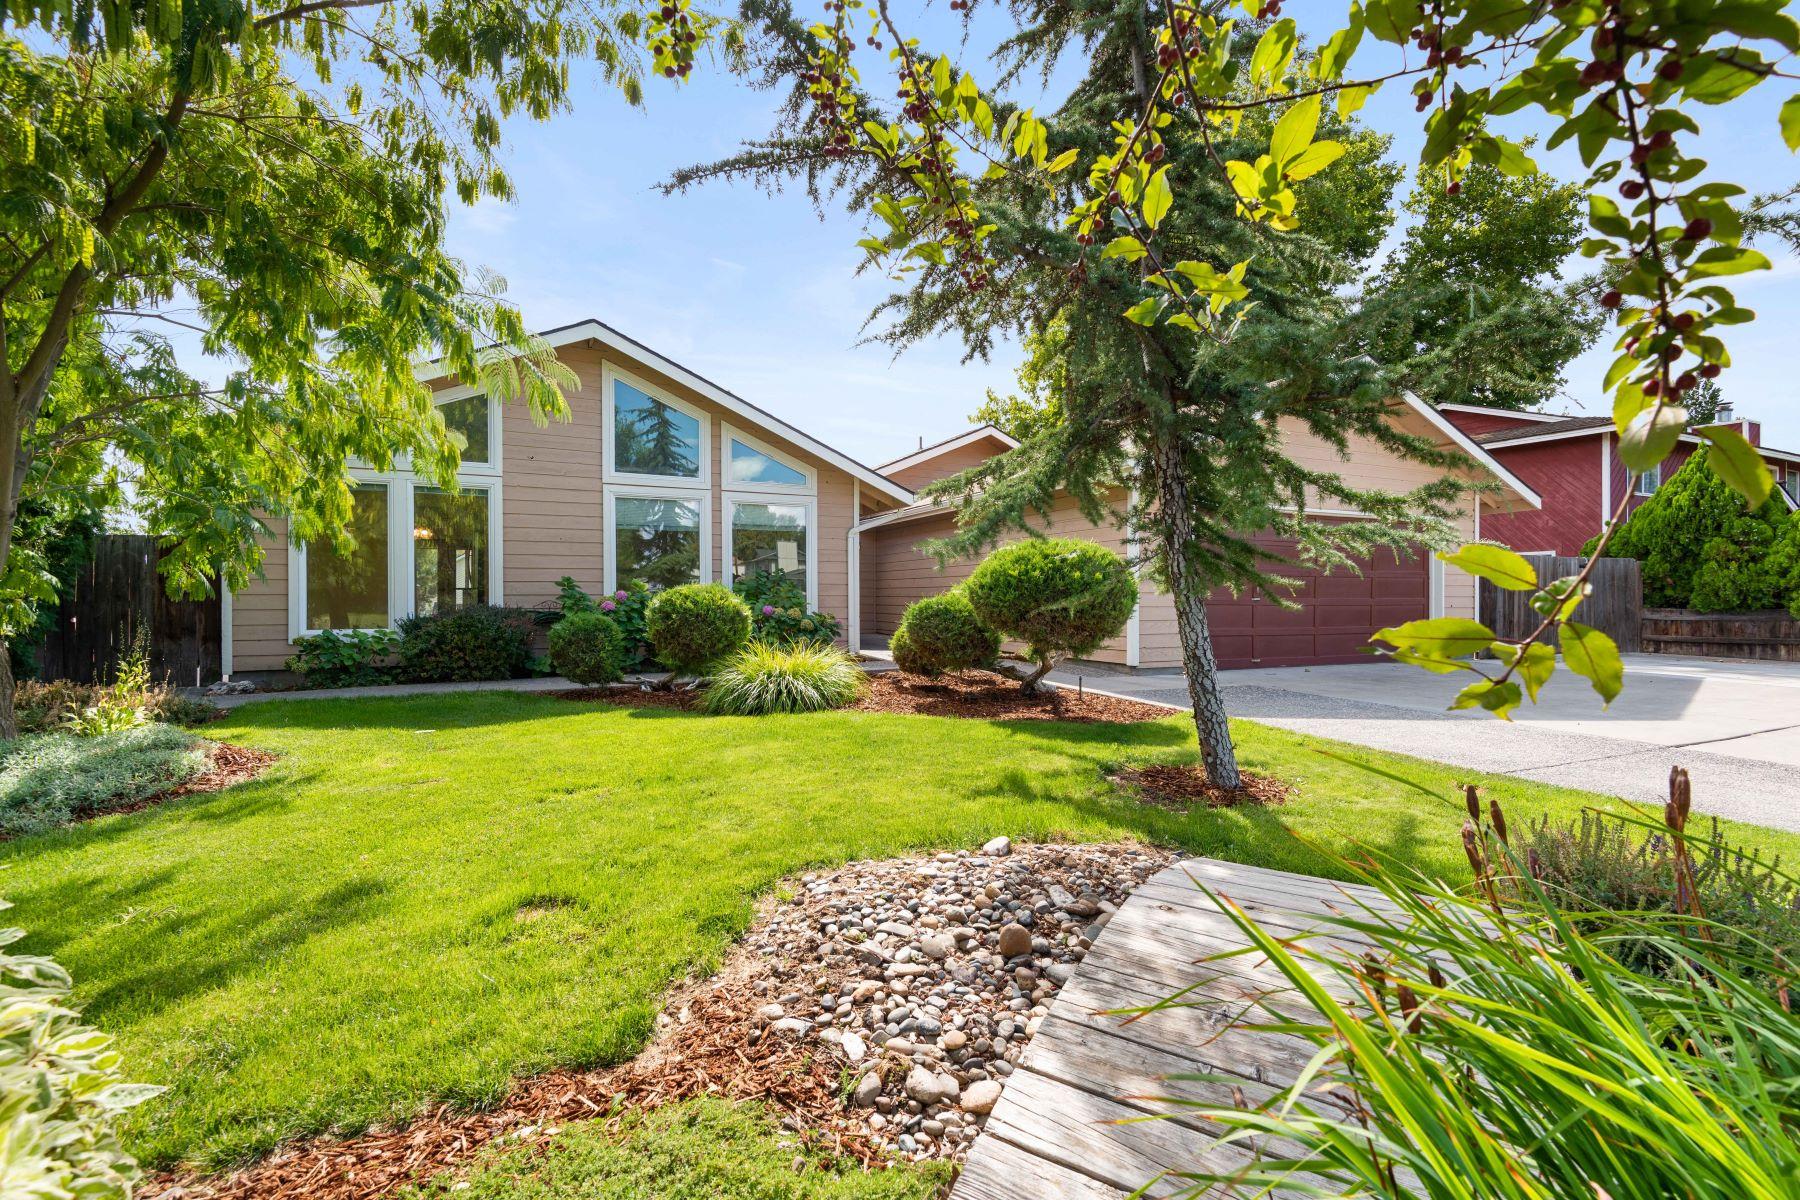 Single Family Homes por un Venta en Beautifully updated and read for its new family! 5113 Chukar Drive West Richland, Washington 99353 Estados Unidos